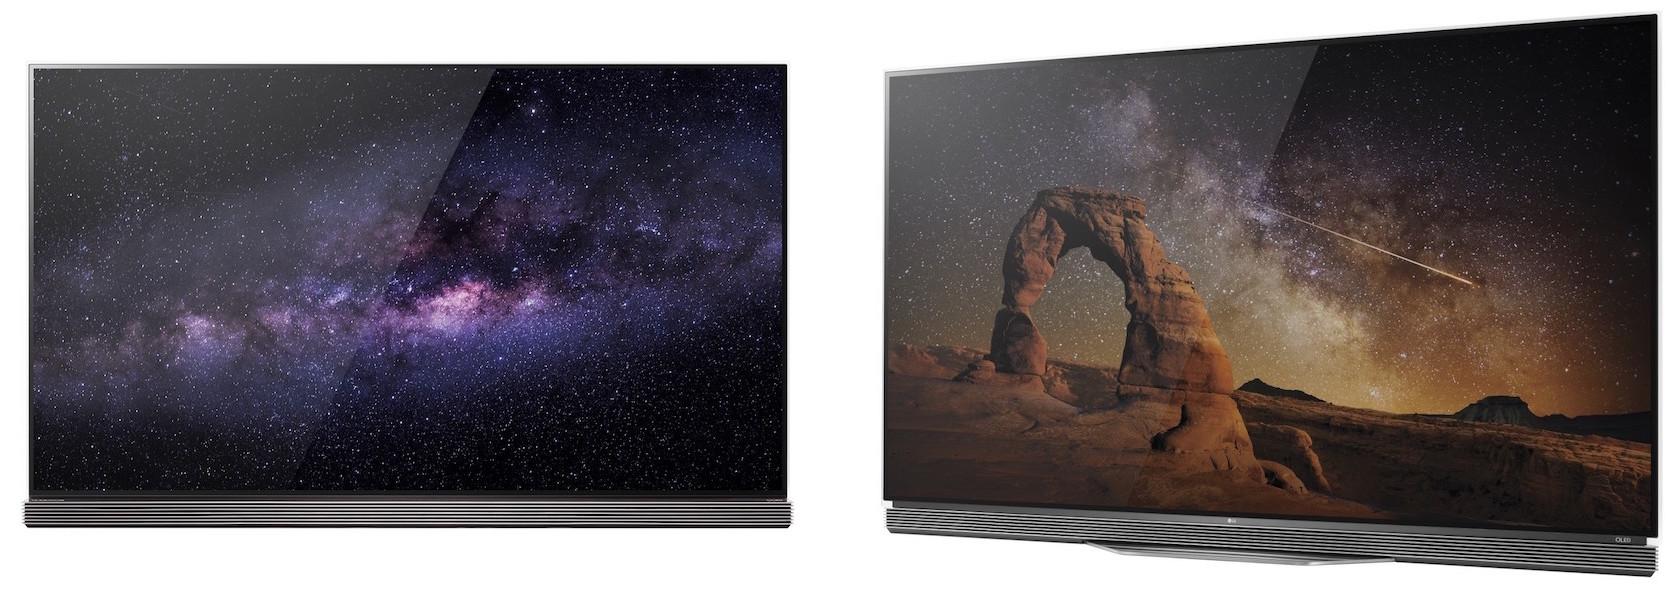 OLED-TV-_E6_G6-1